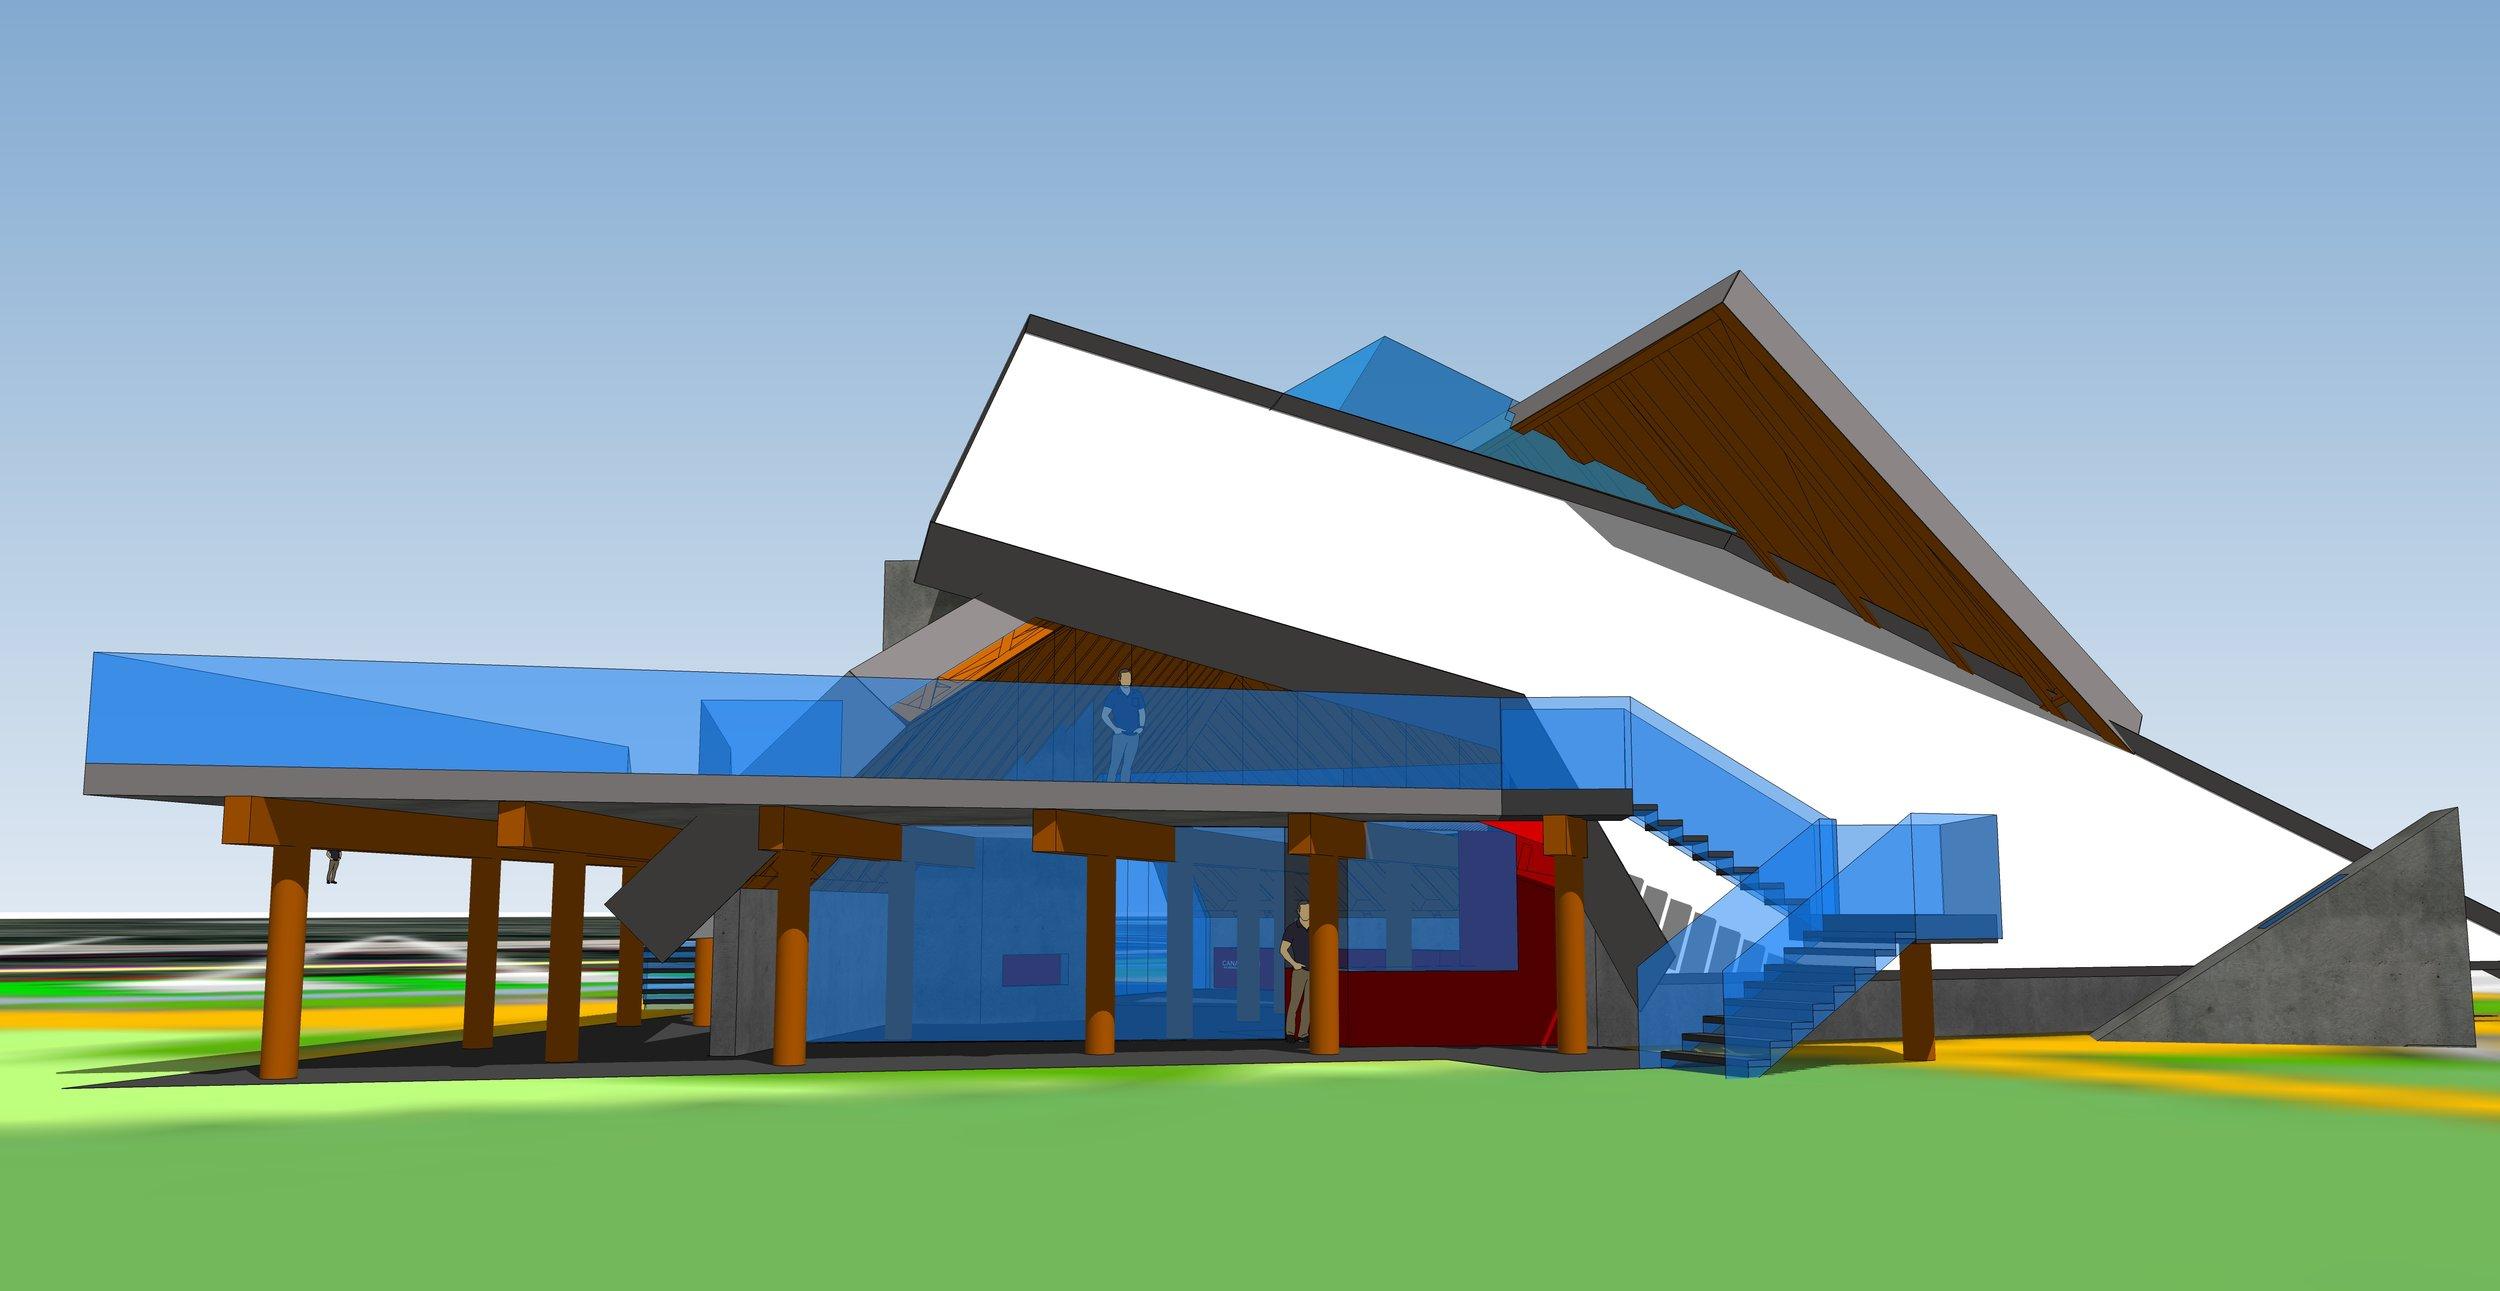 2018-10-29-Site & Building_3d-b.jpg